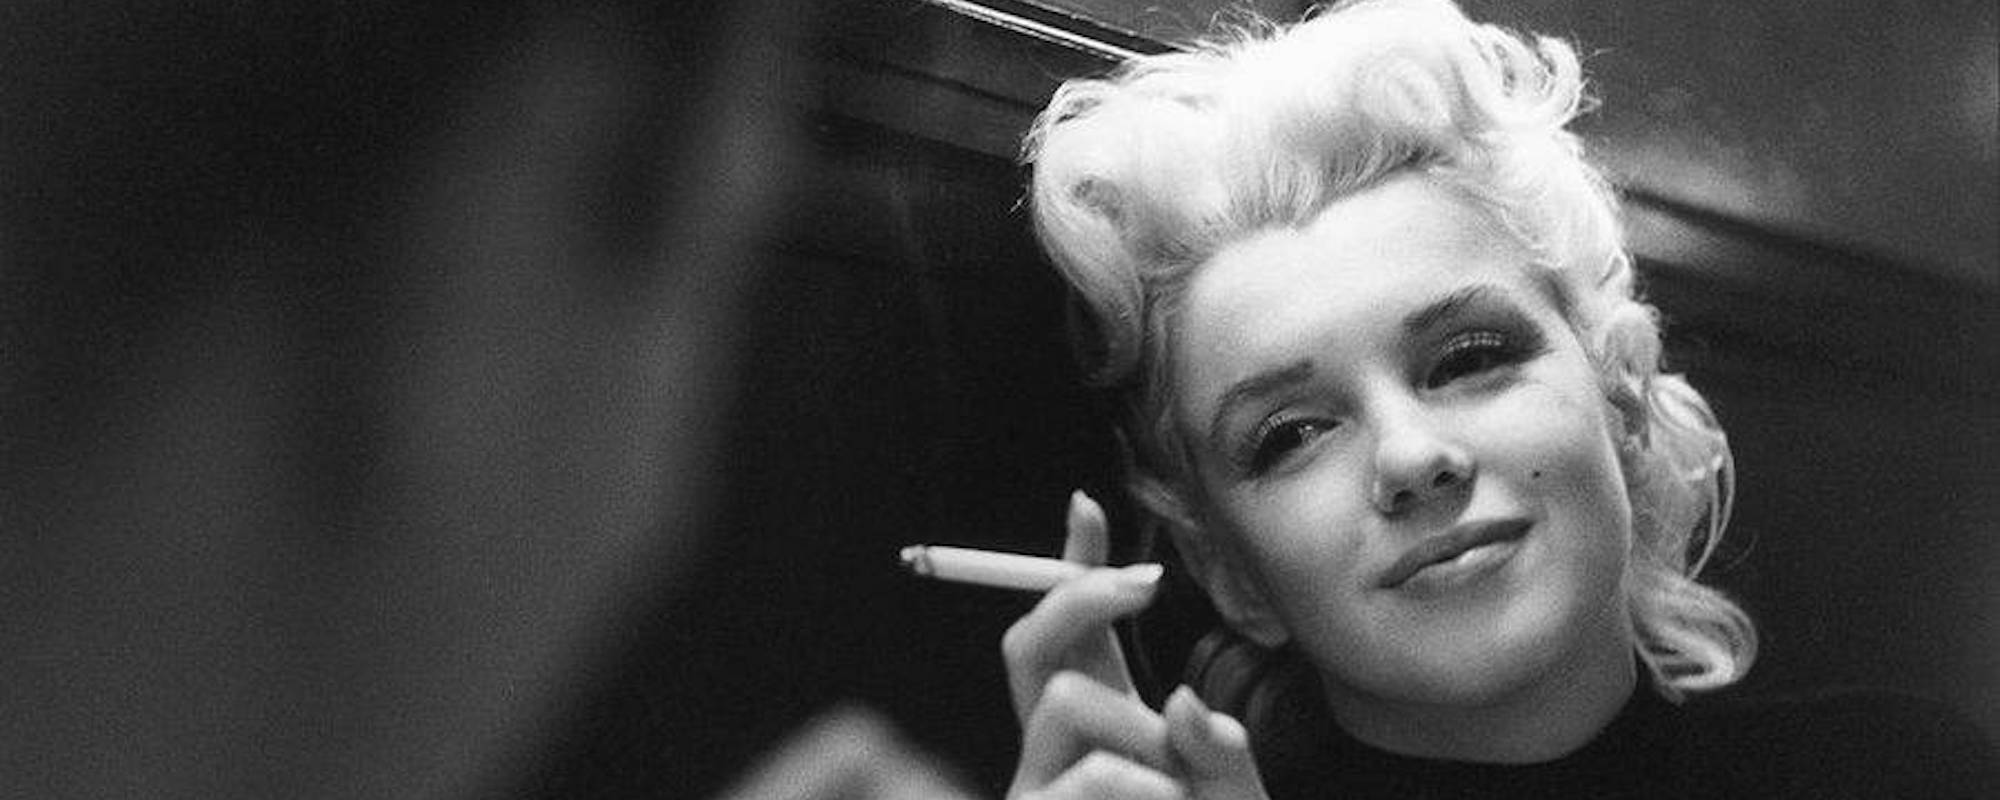 Marilyn Monroe's Death